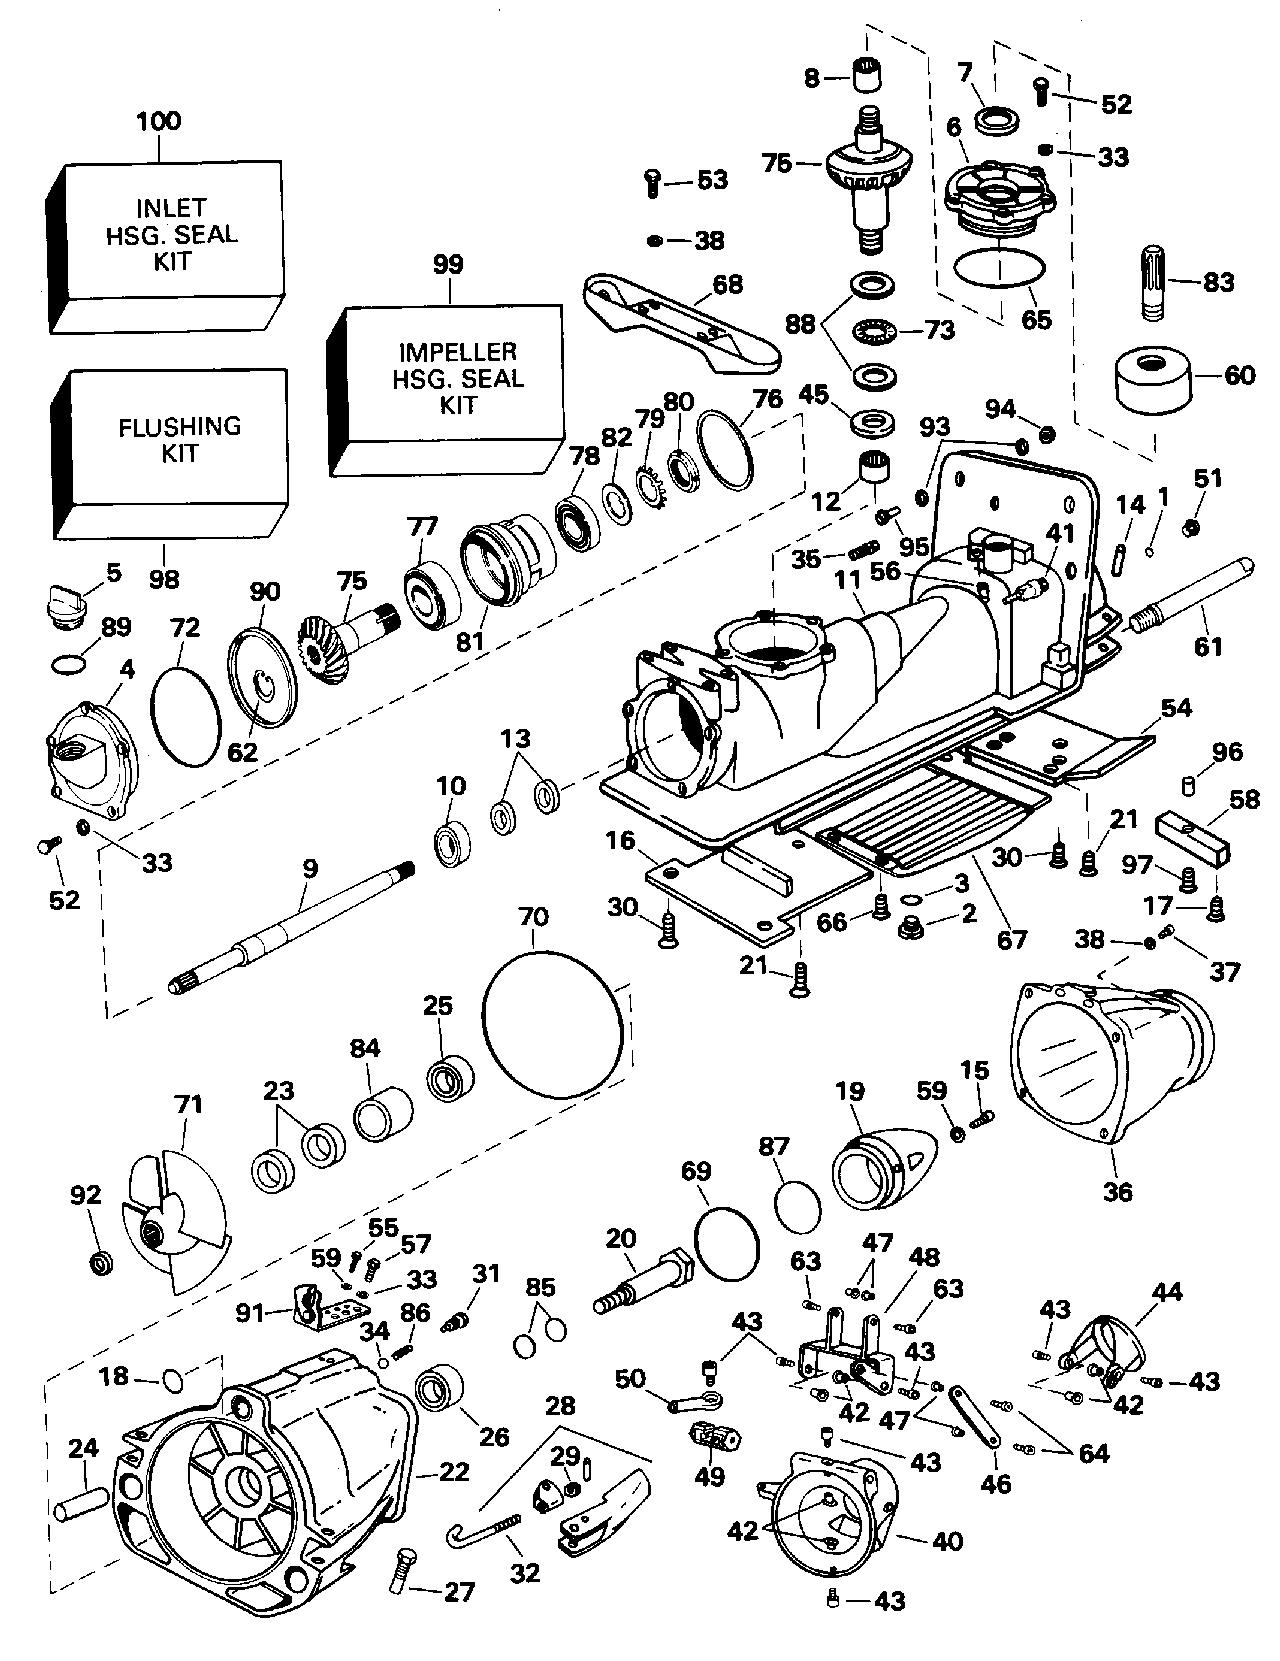 [DIAGRAM_5LK]  BRP | TURBOJET | 1995 | 115 | 115JEEOB 1995 | JET PUMP - Evinrude/Johnson/ OMC outboard motor parts - Van's Sport Center | Wiring Diagram Omc 115 Turbojet |  | Van's Sport Center